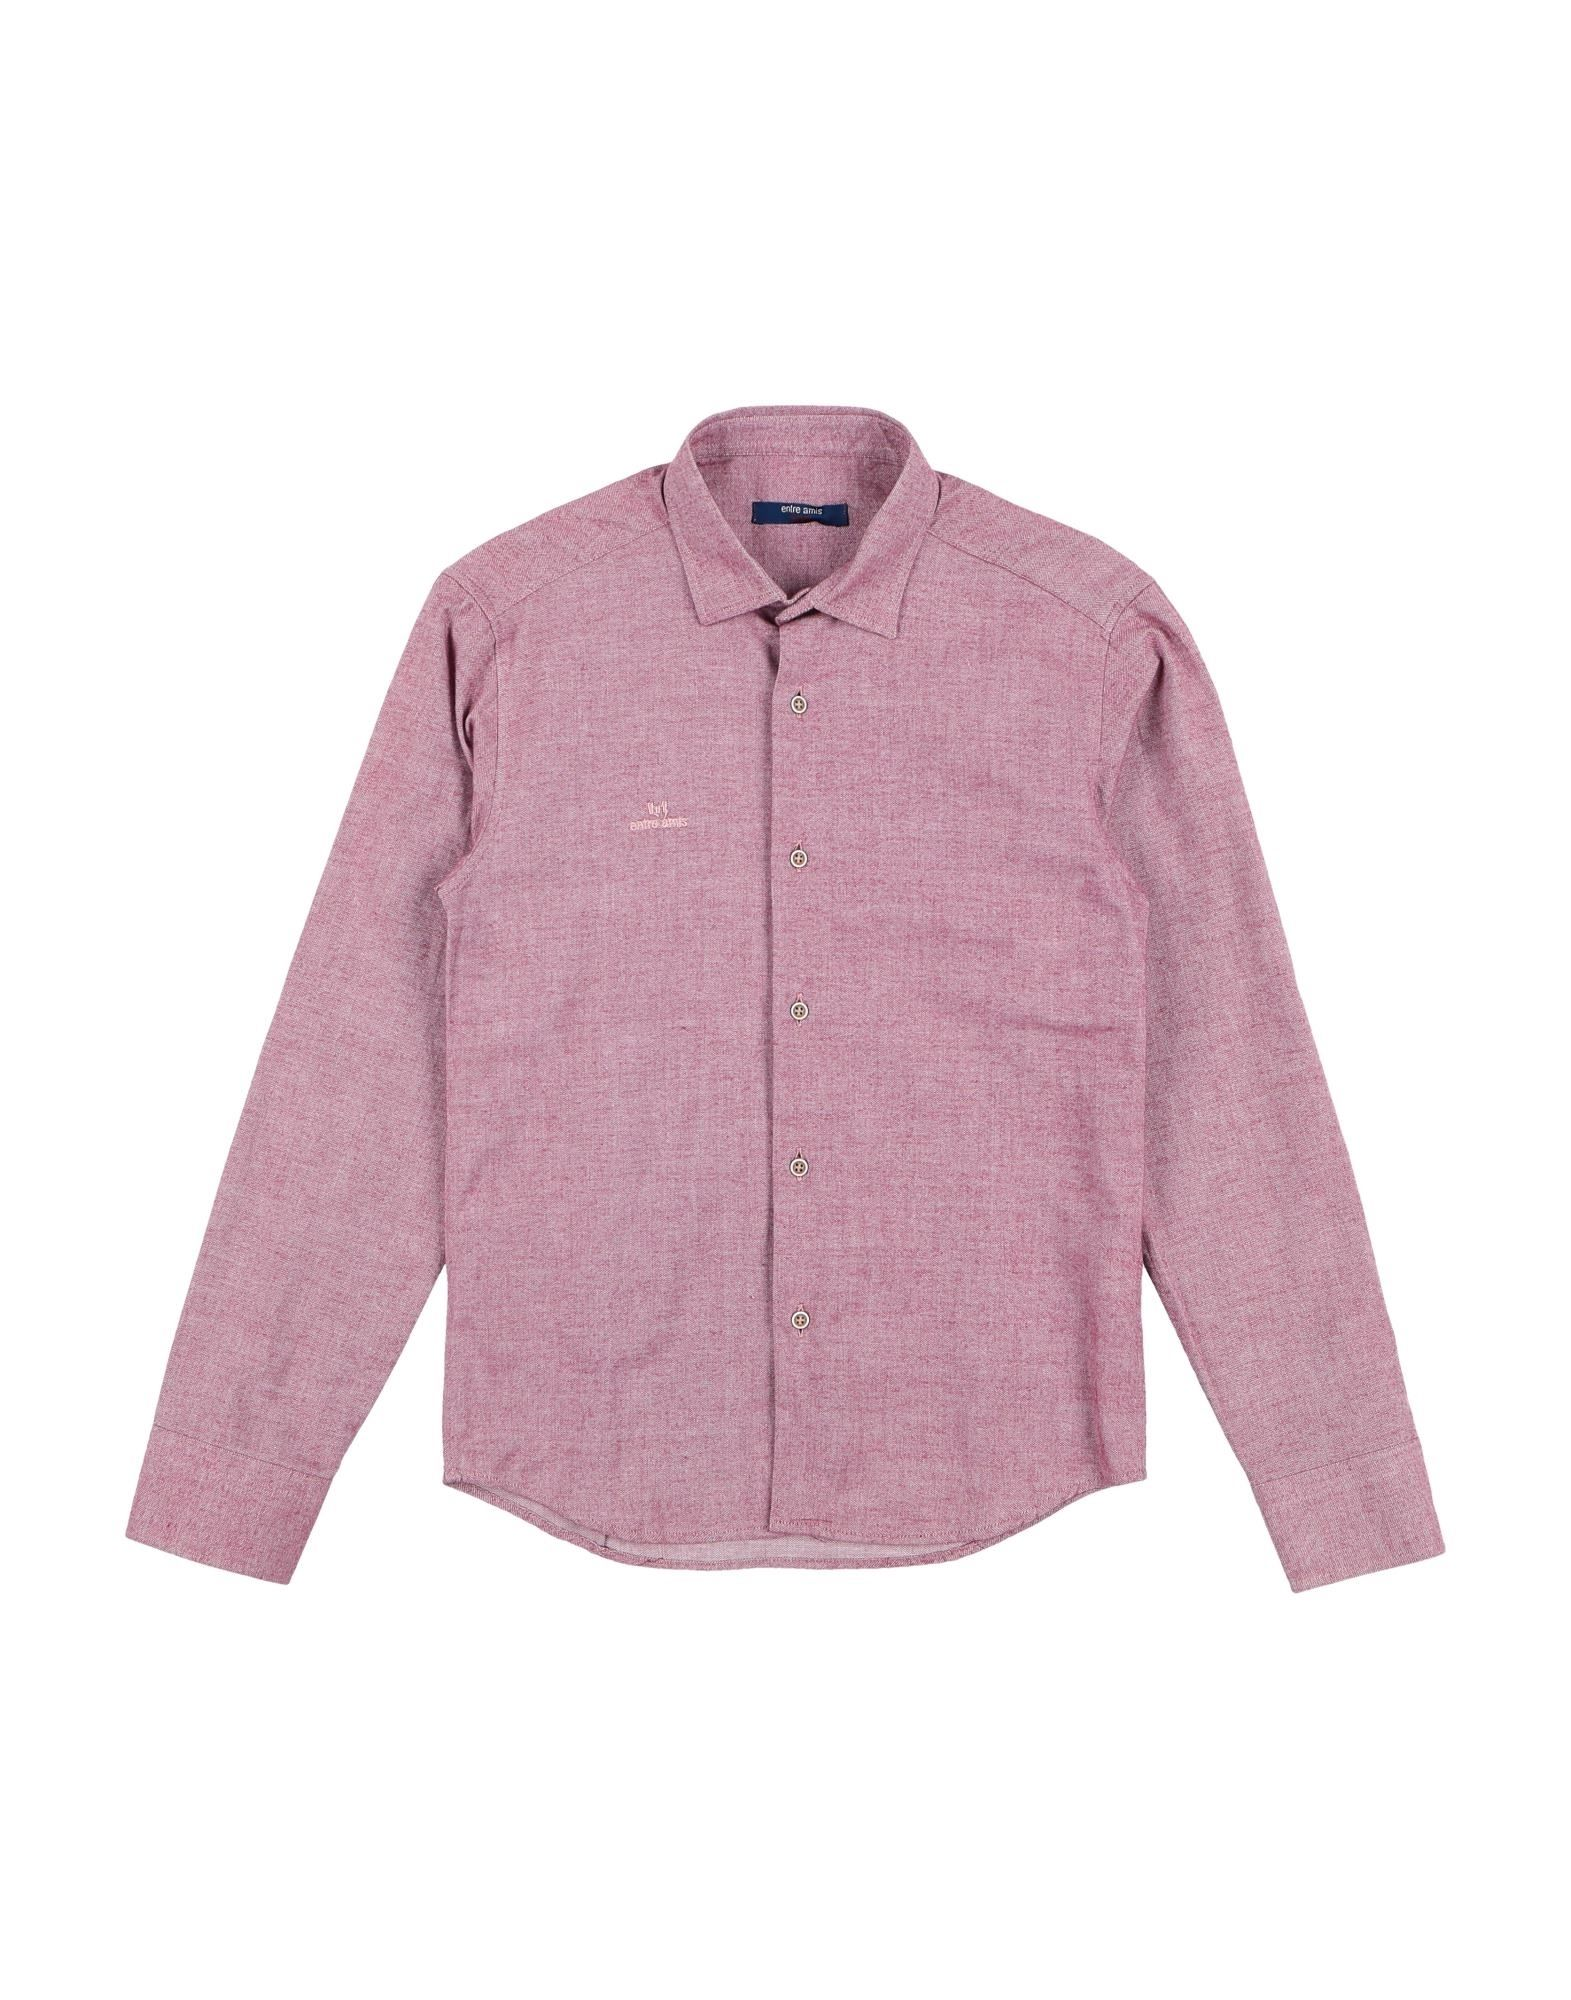 Entre Amis Garçon Kids' Shirts In Pink